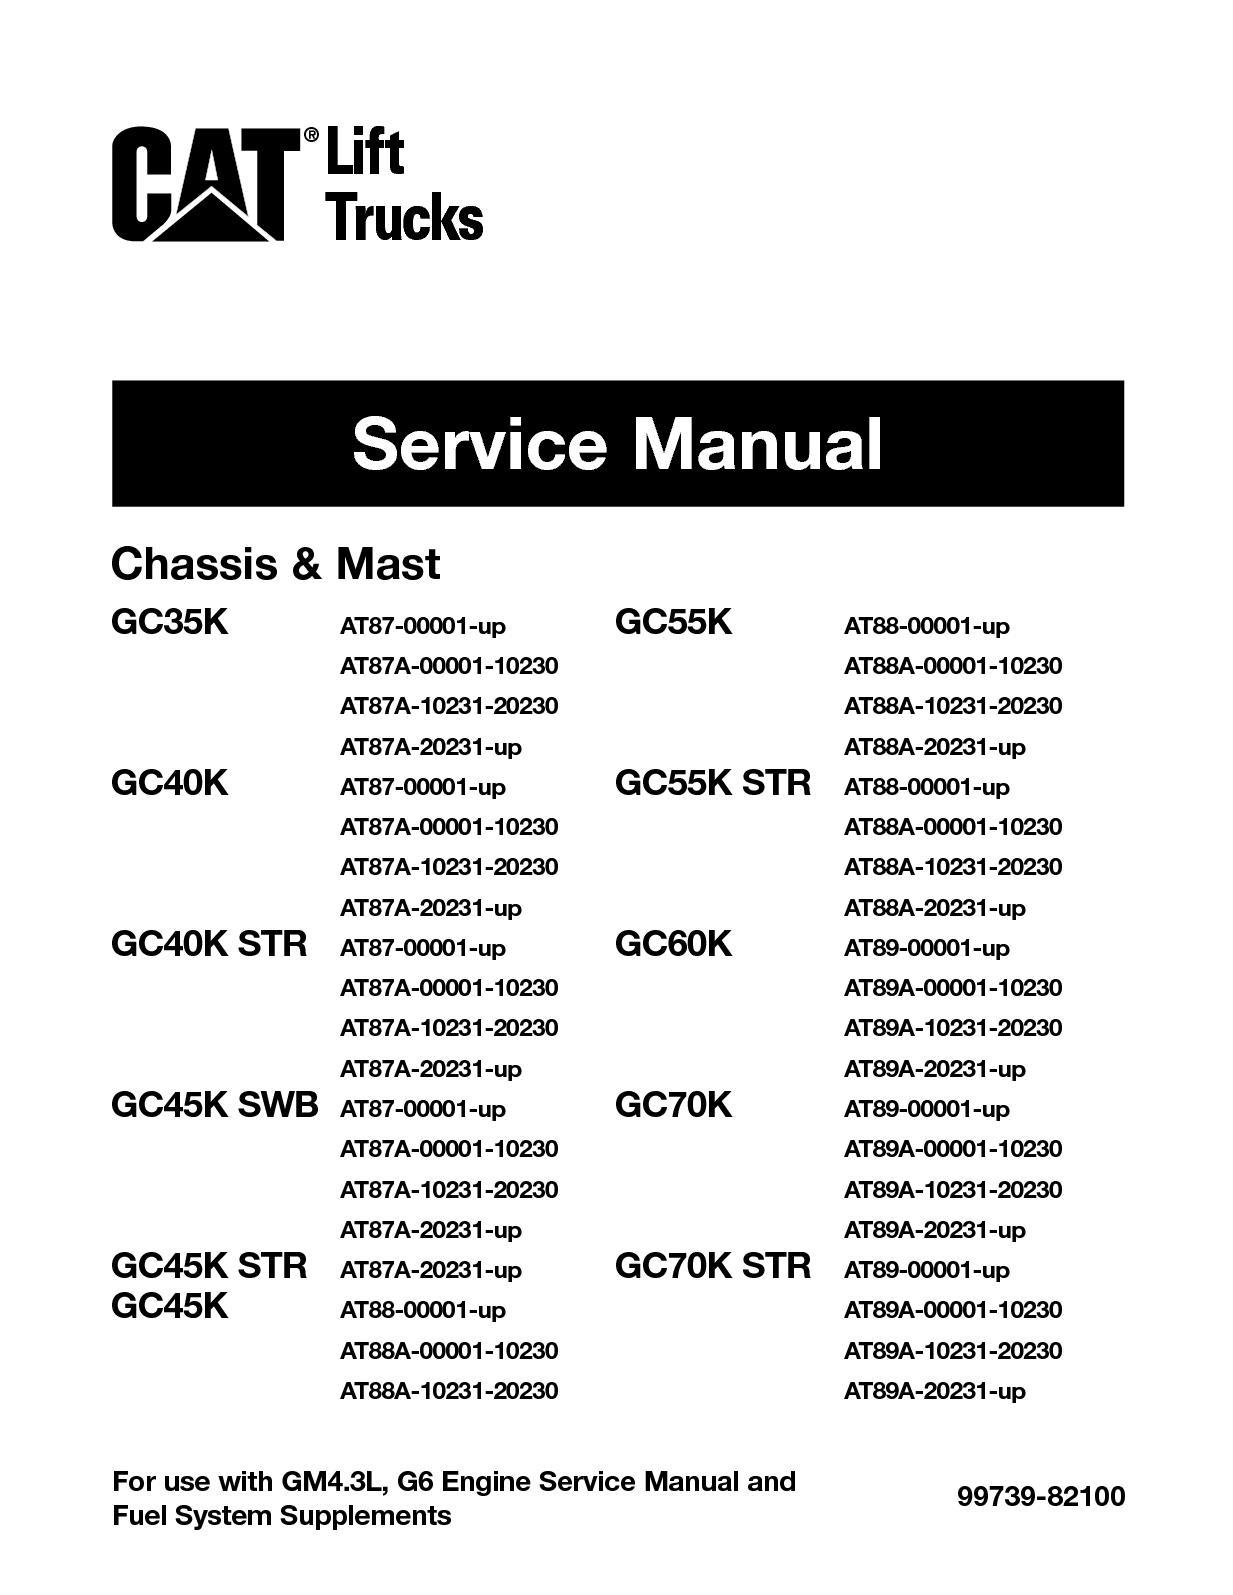 calam o caterpillar cat gc40k forklift lift trucks. Black Bedroom Furniture Sets. Home Design Ideas